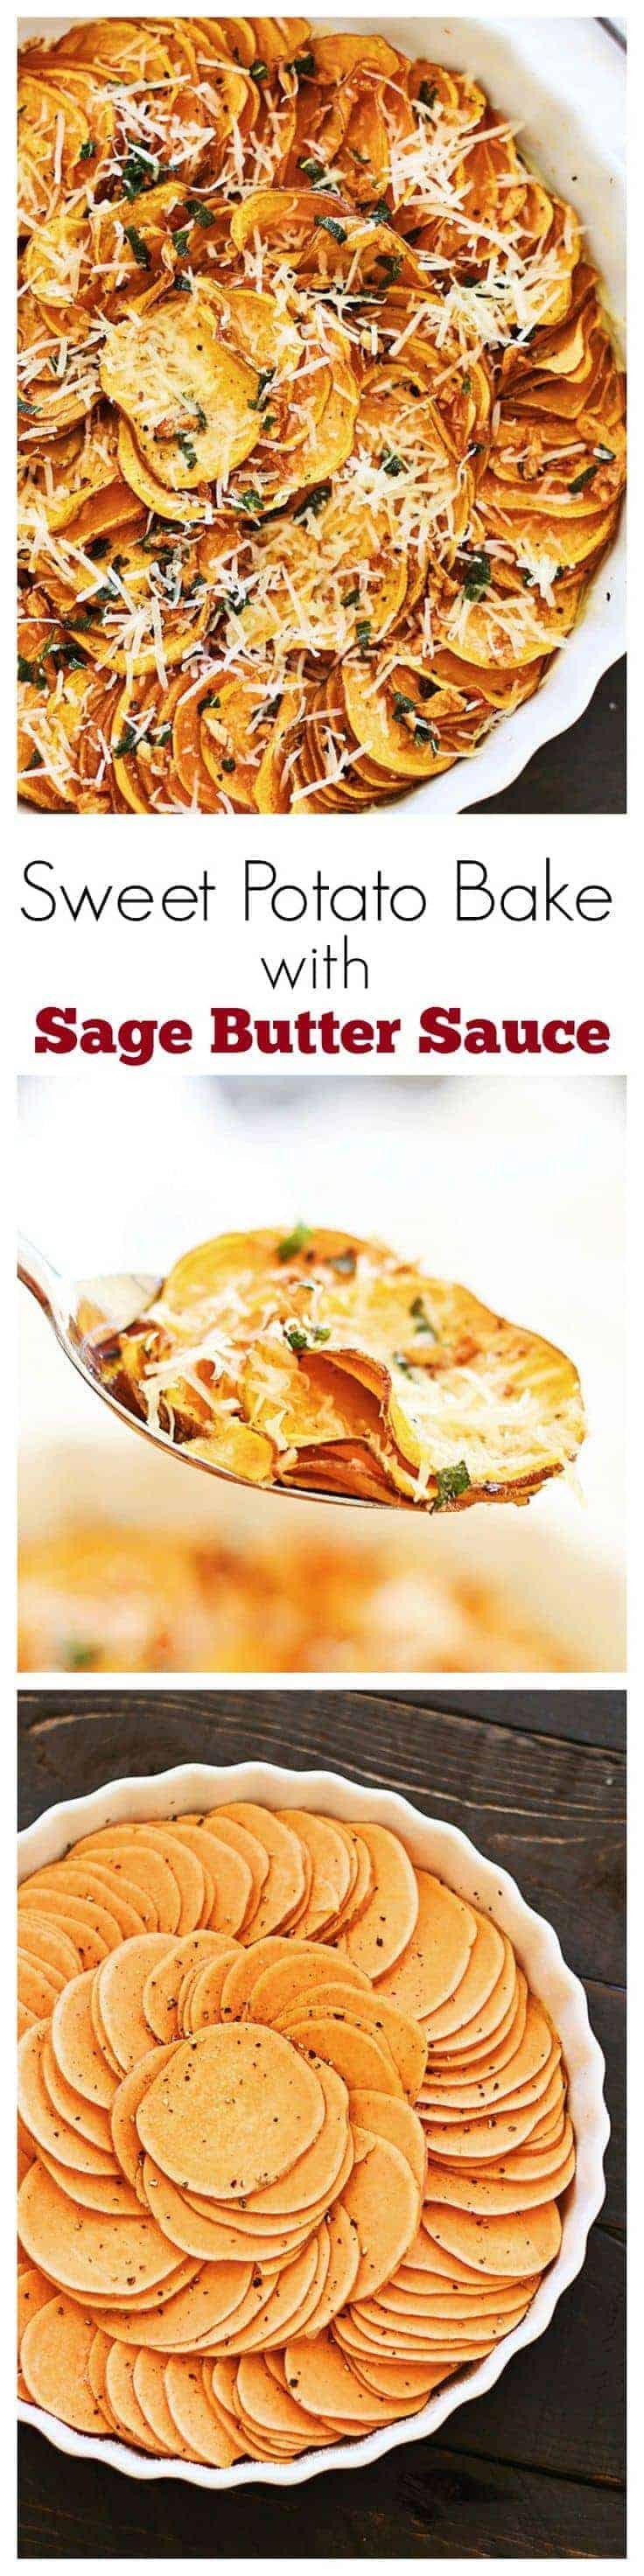 Sweet Potato Butter  Sweet Potato Bake with Sage Butter Sauce